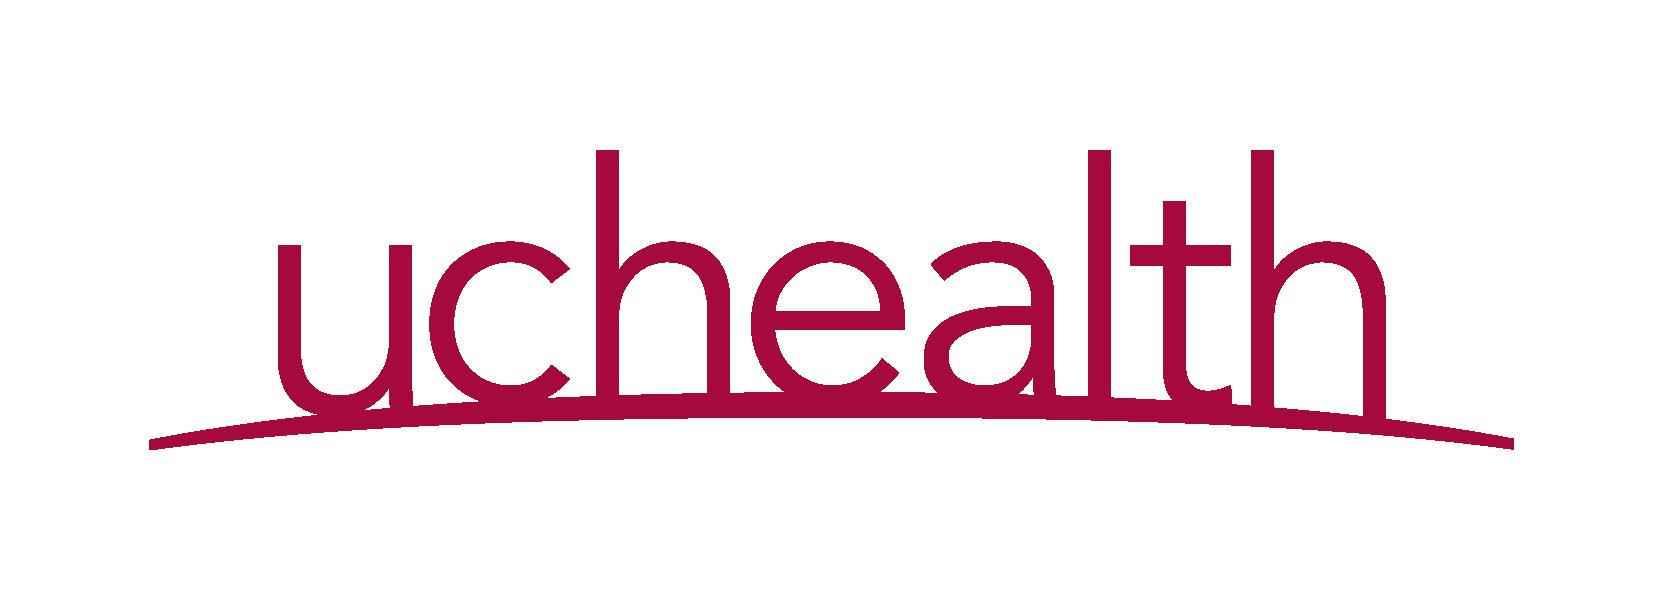 uchealth logo.